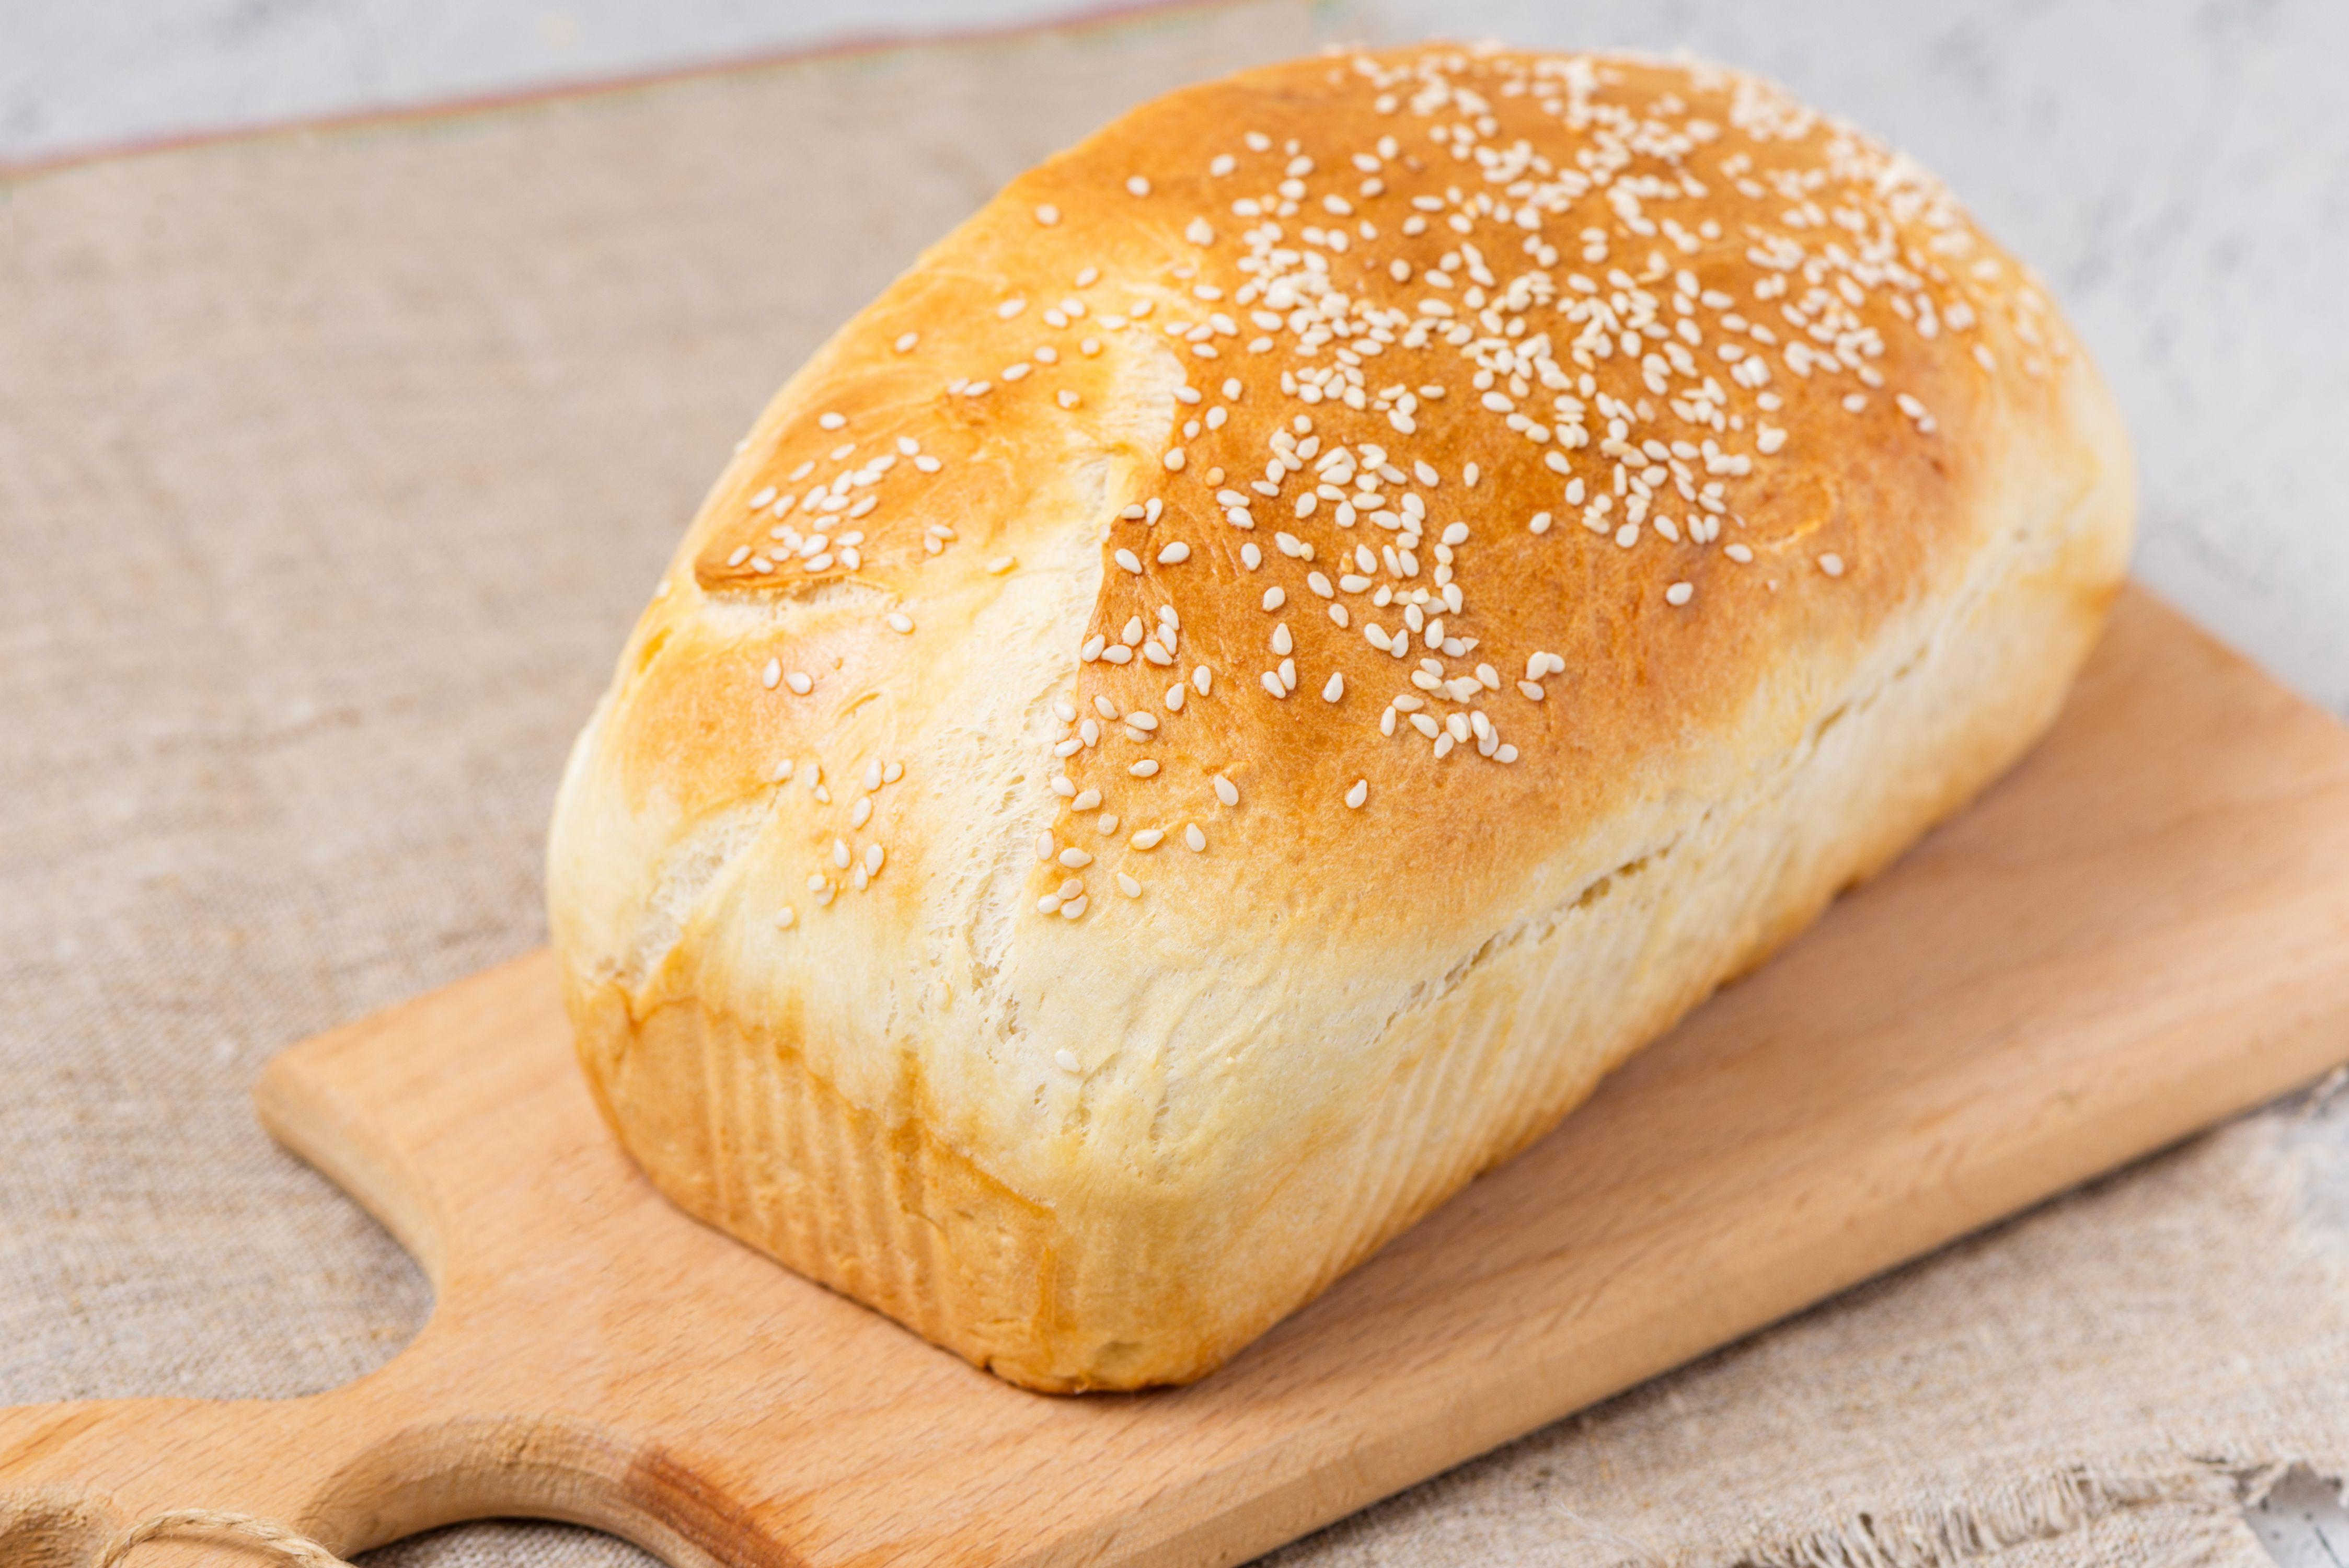 Honey Buttermilk Yeast Bread Recipe For Your Bread Machine Honey Buttermilk Bread Bread Machine Recipes Bread Maker Recipes